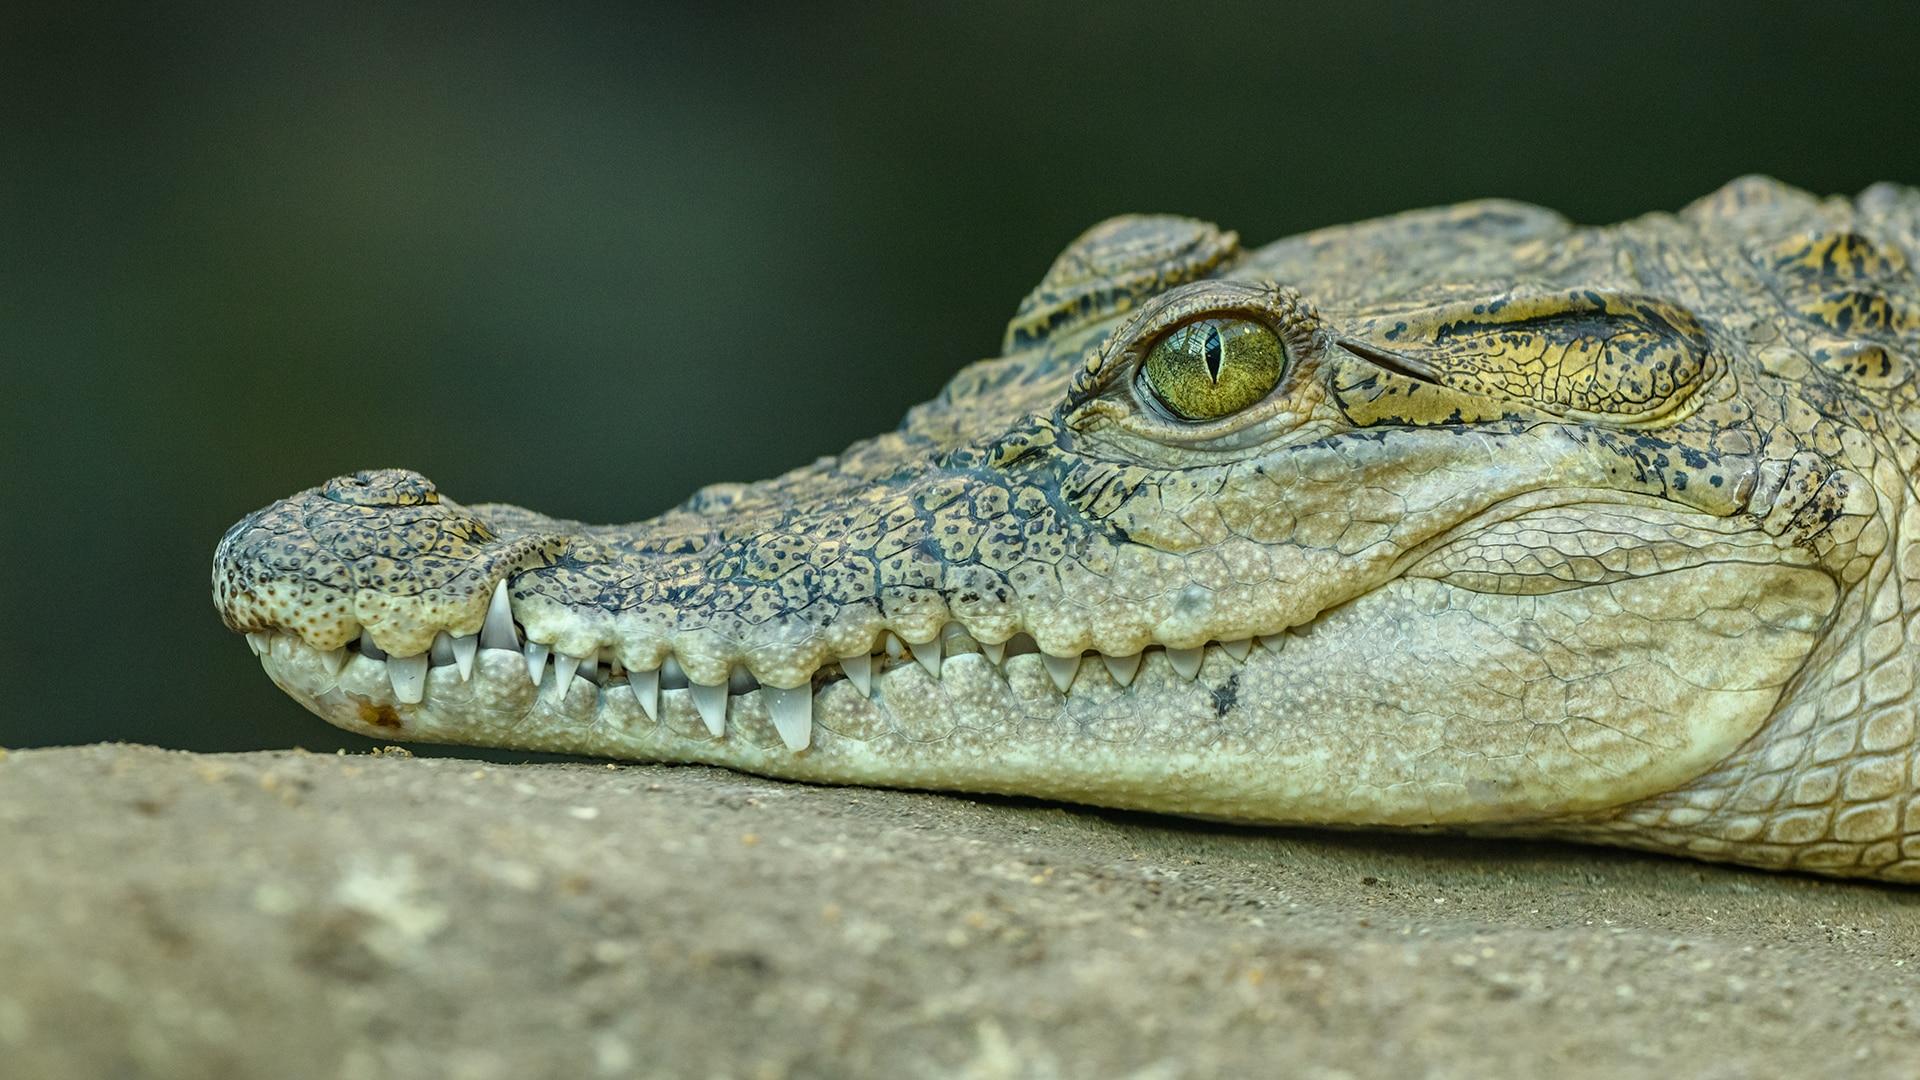 Crocodile head